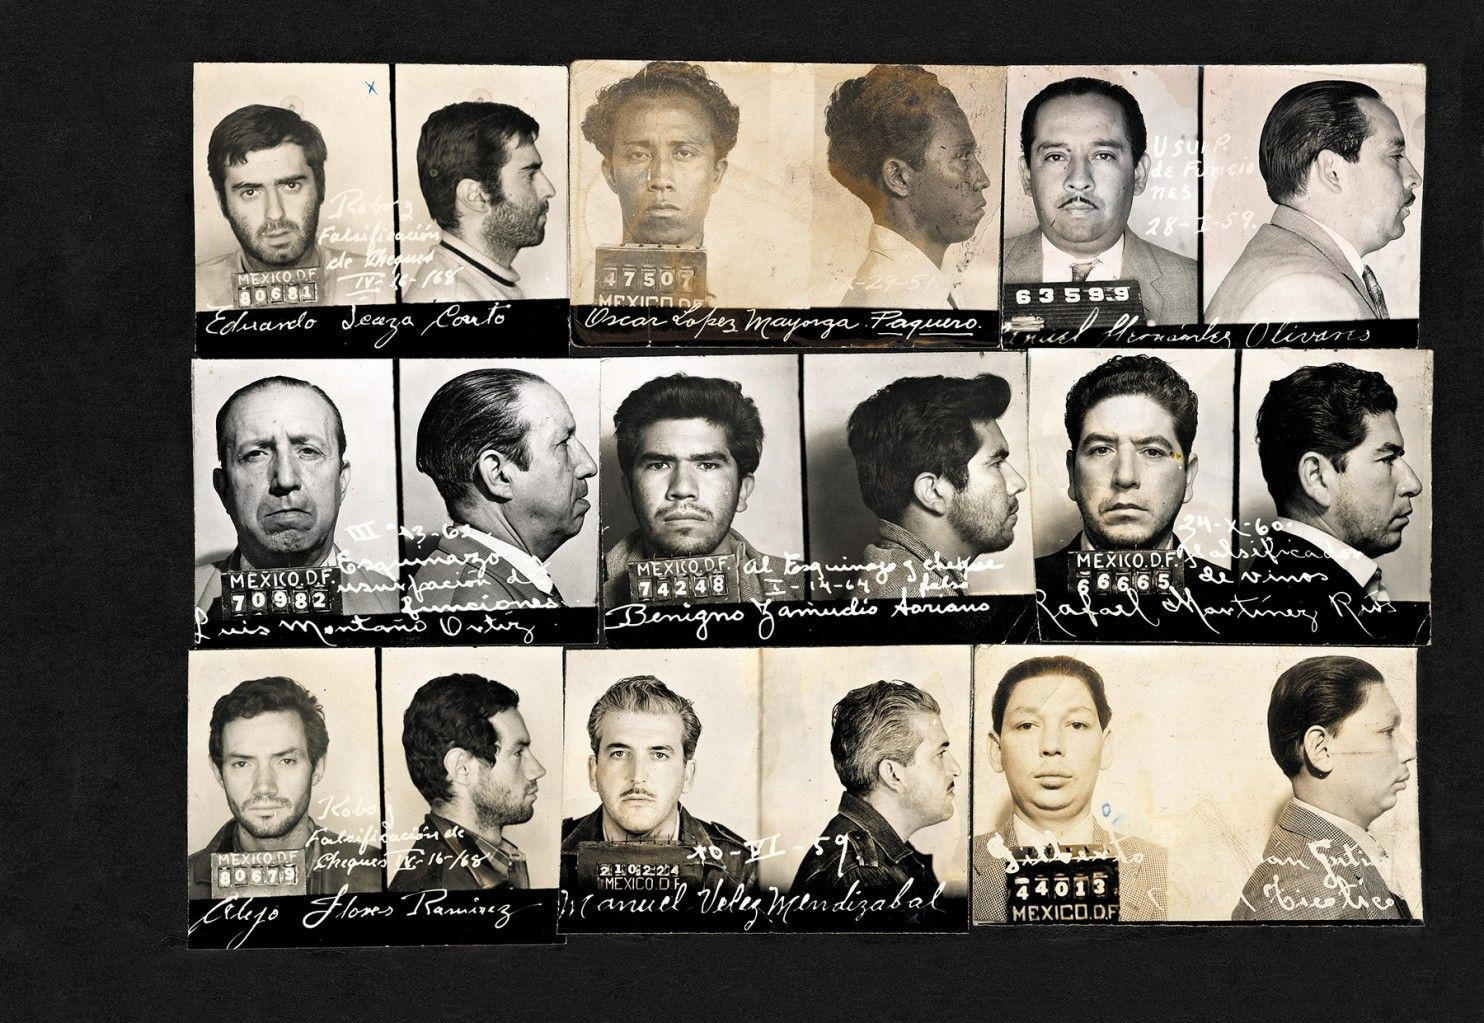 The strange beauty of vintage Mexican crime photos - The Washington Post